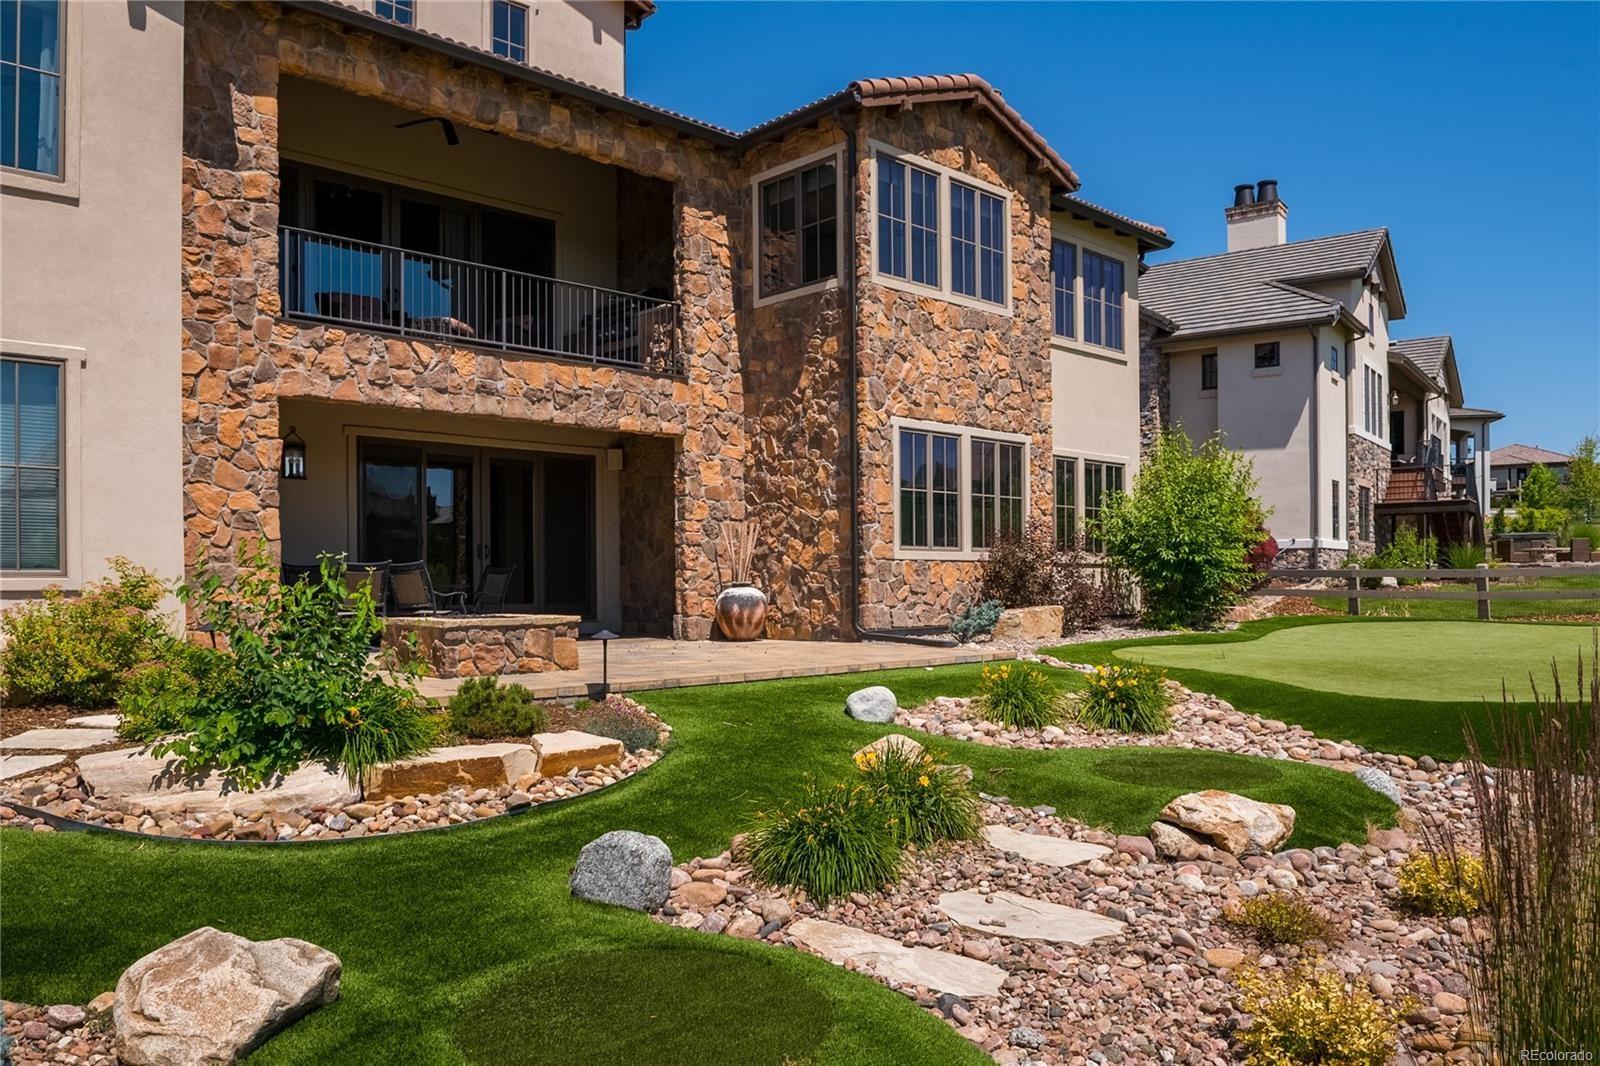 MLS# 8045685 - 21 - 40 Flowerburst Way, Highlands Ranch, CO 80126